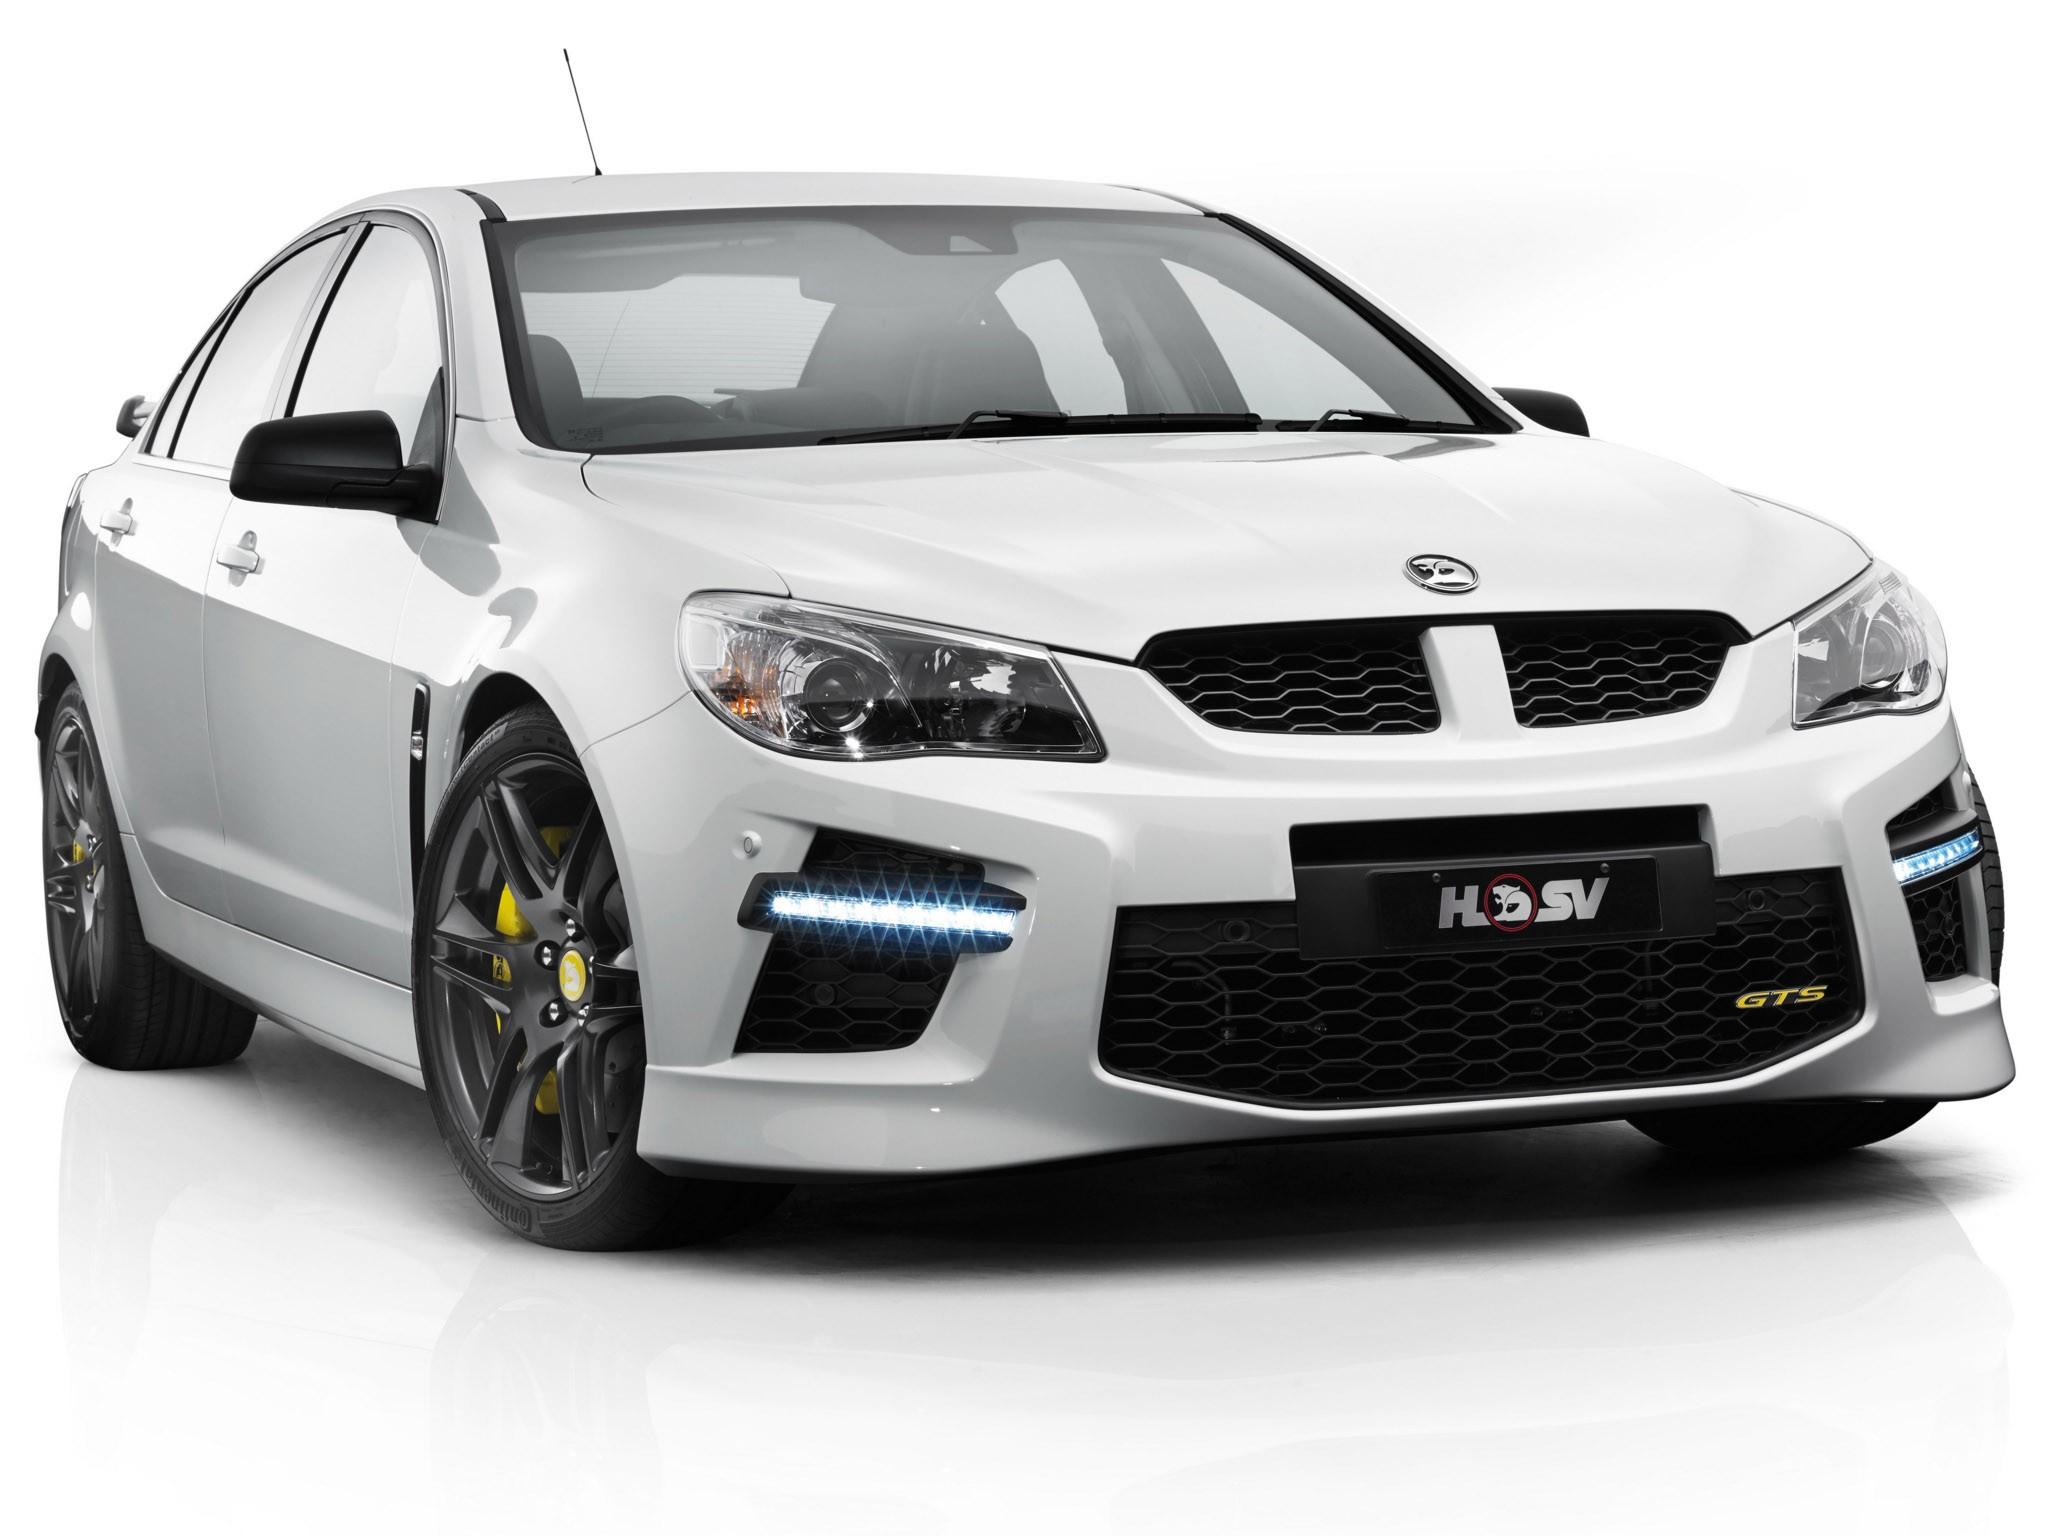 2013 HSV GTS Gen-F